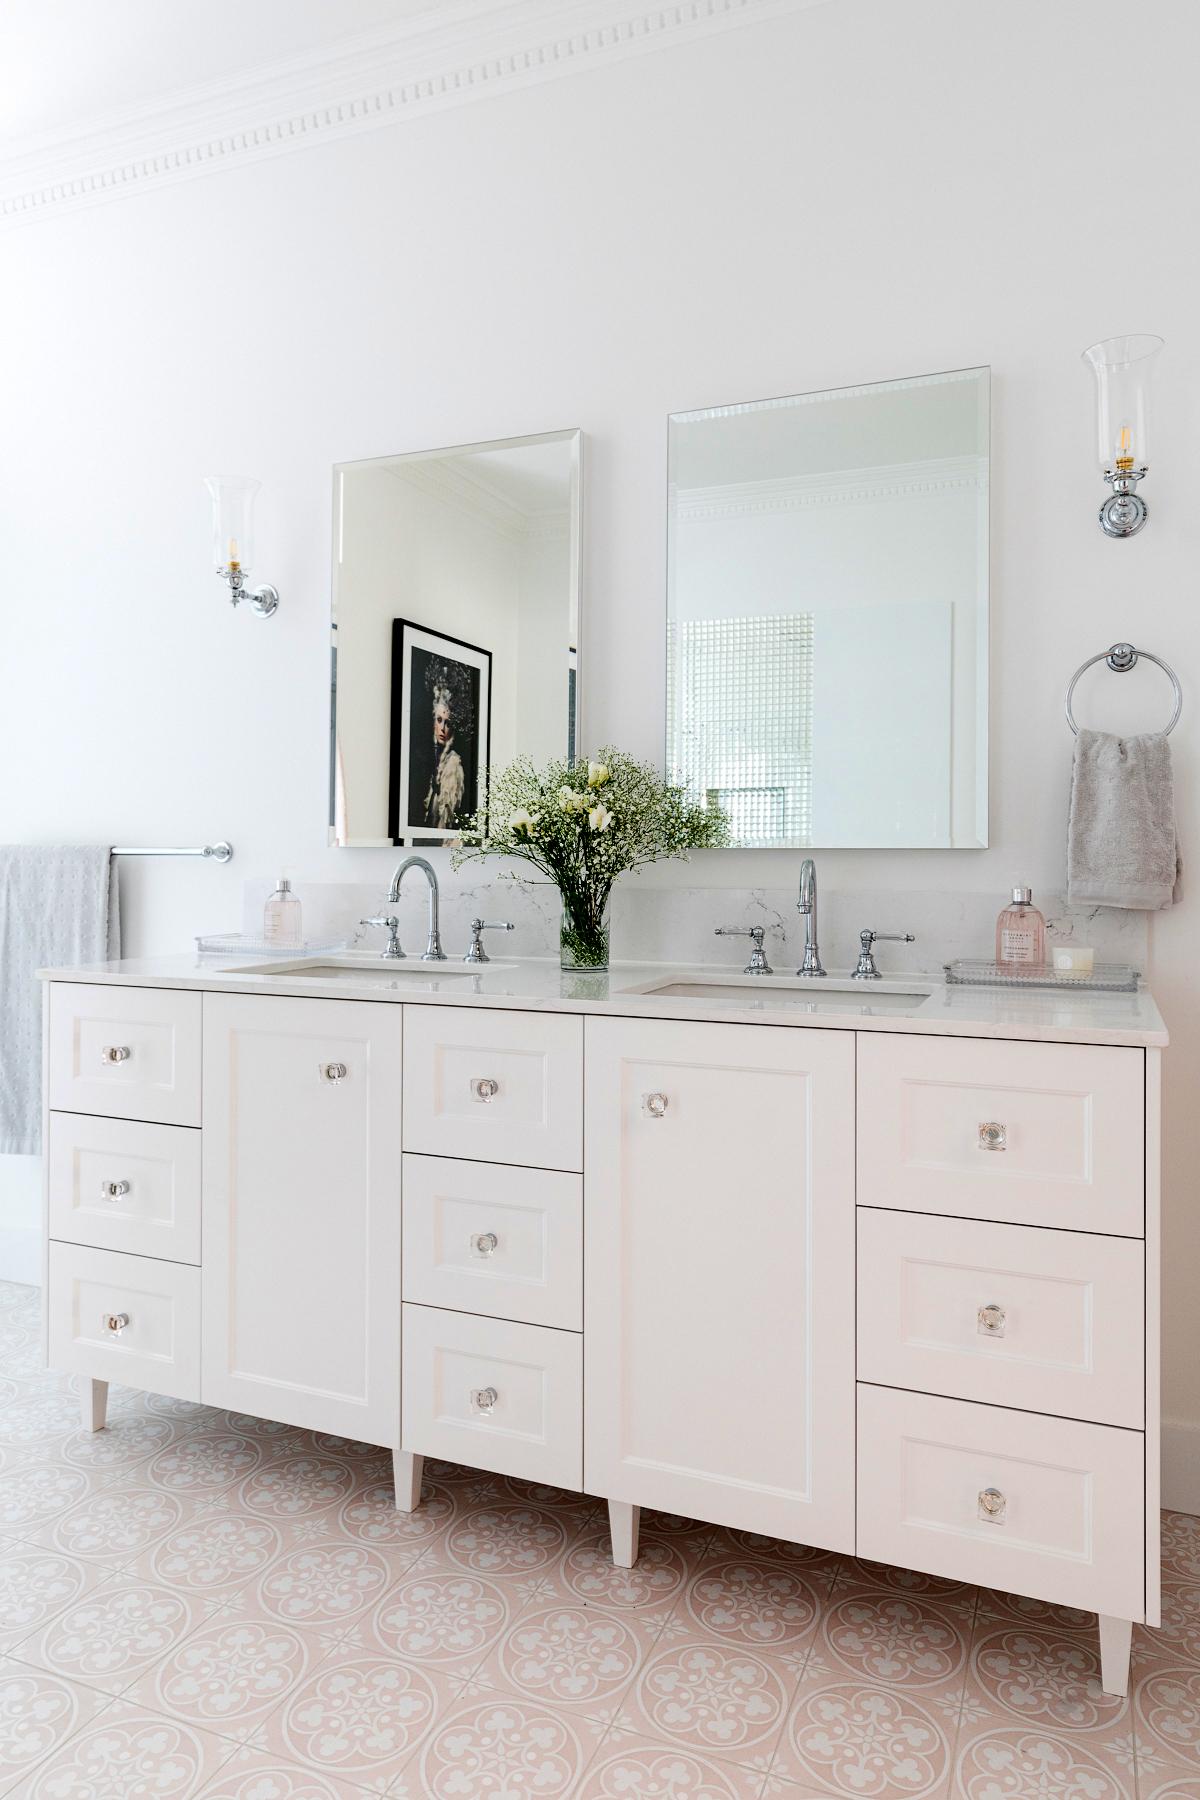 Clayfield bathroom ensuite portrait custom vanity double bowl mirror Brodware Kristall lever tapware